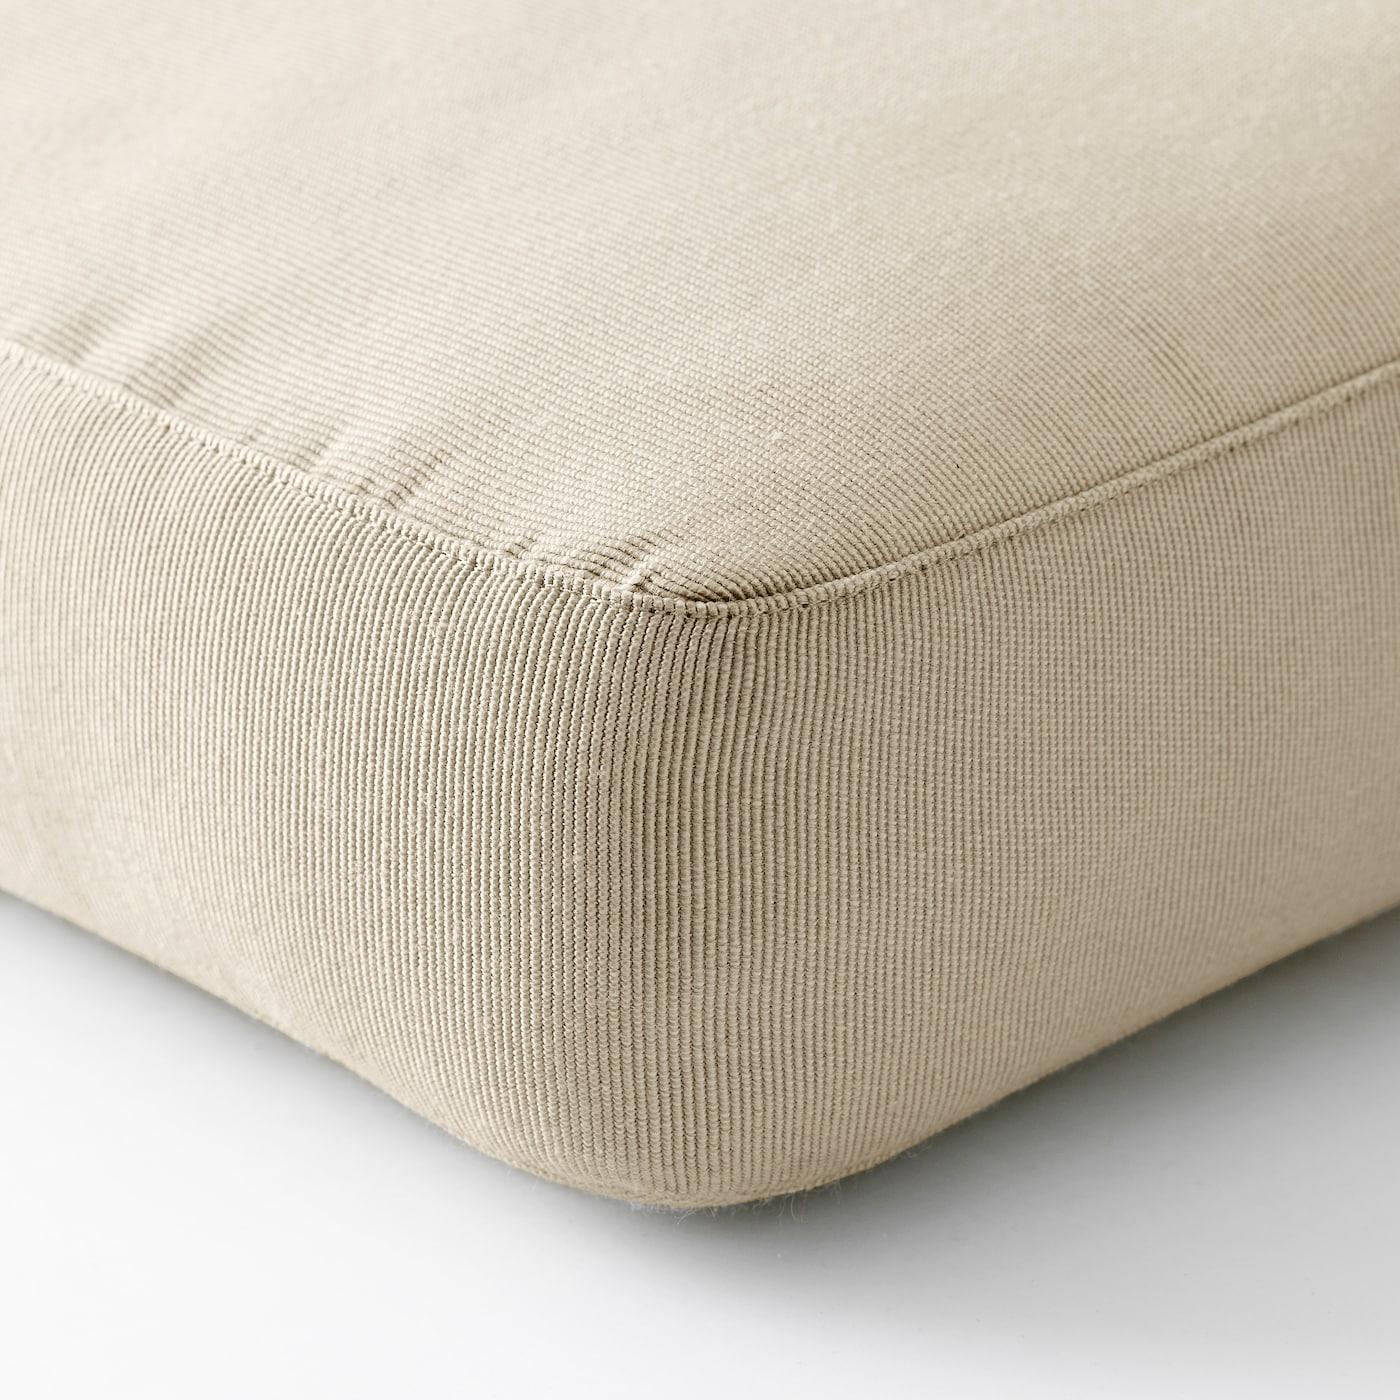 HÅLLÖ Seat cushion, outdoor - beige 9x9 cm